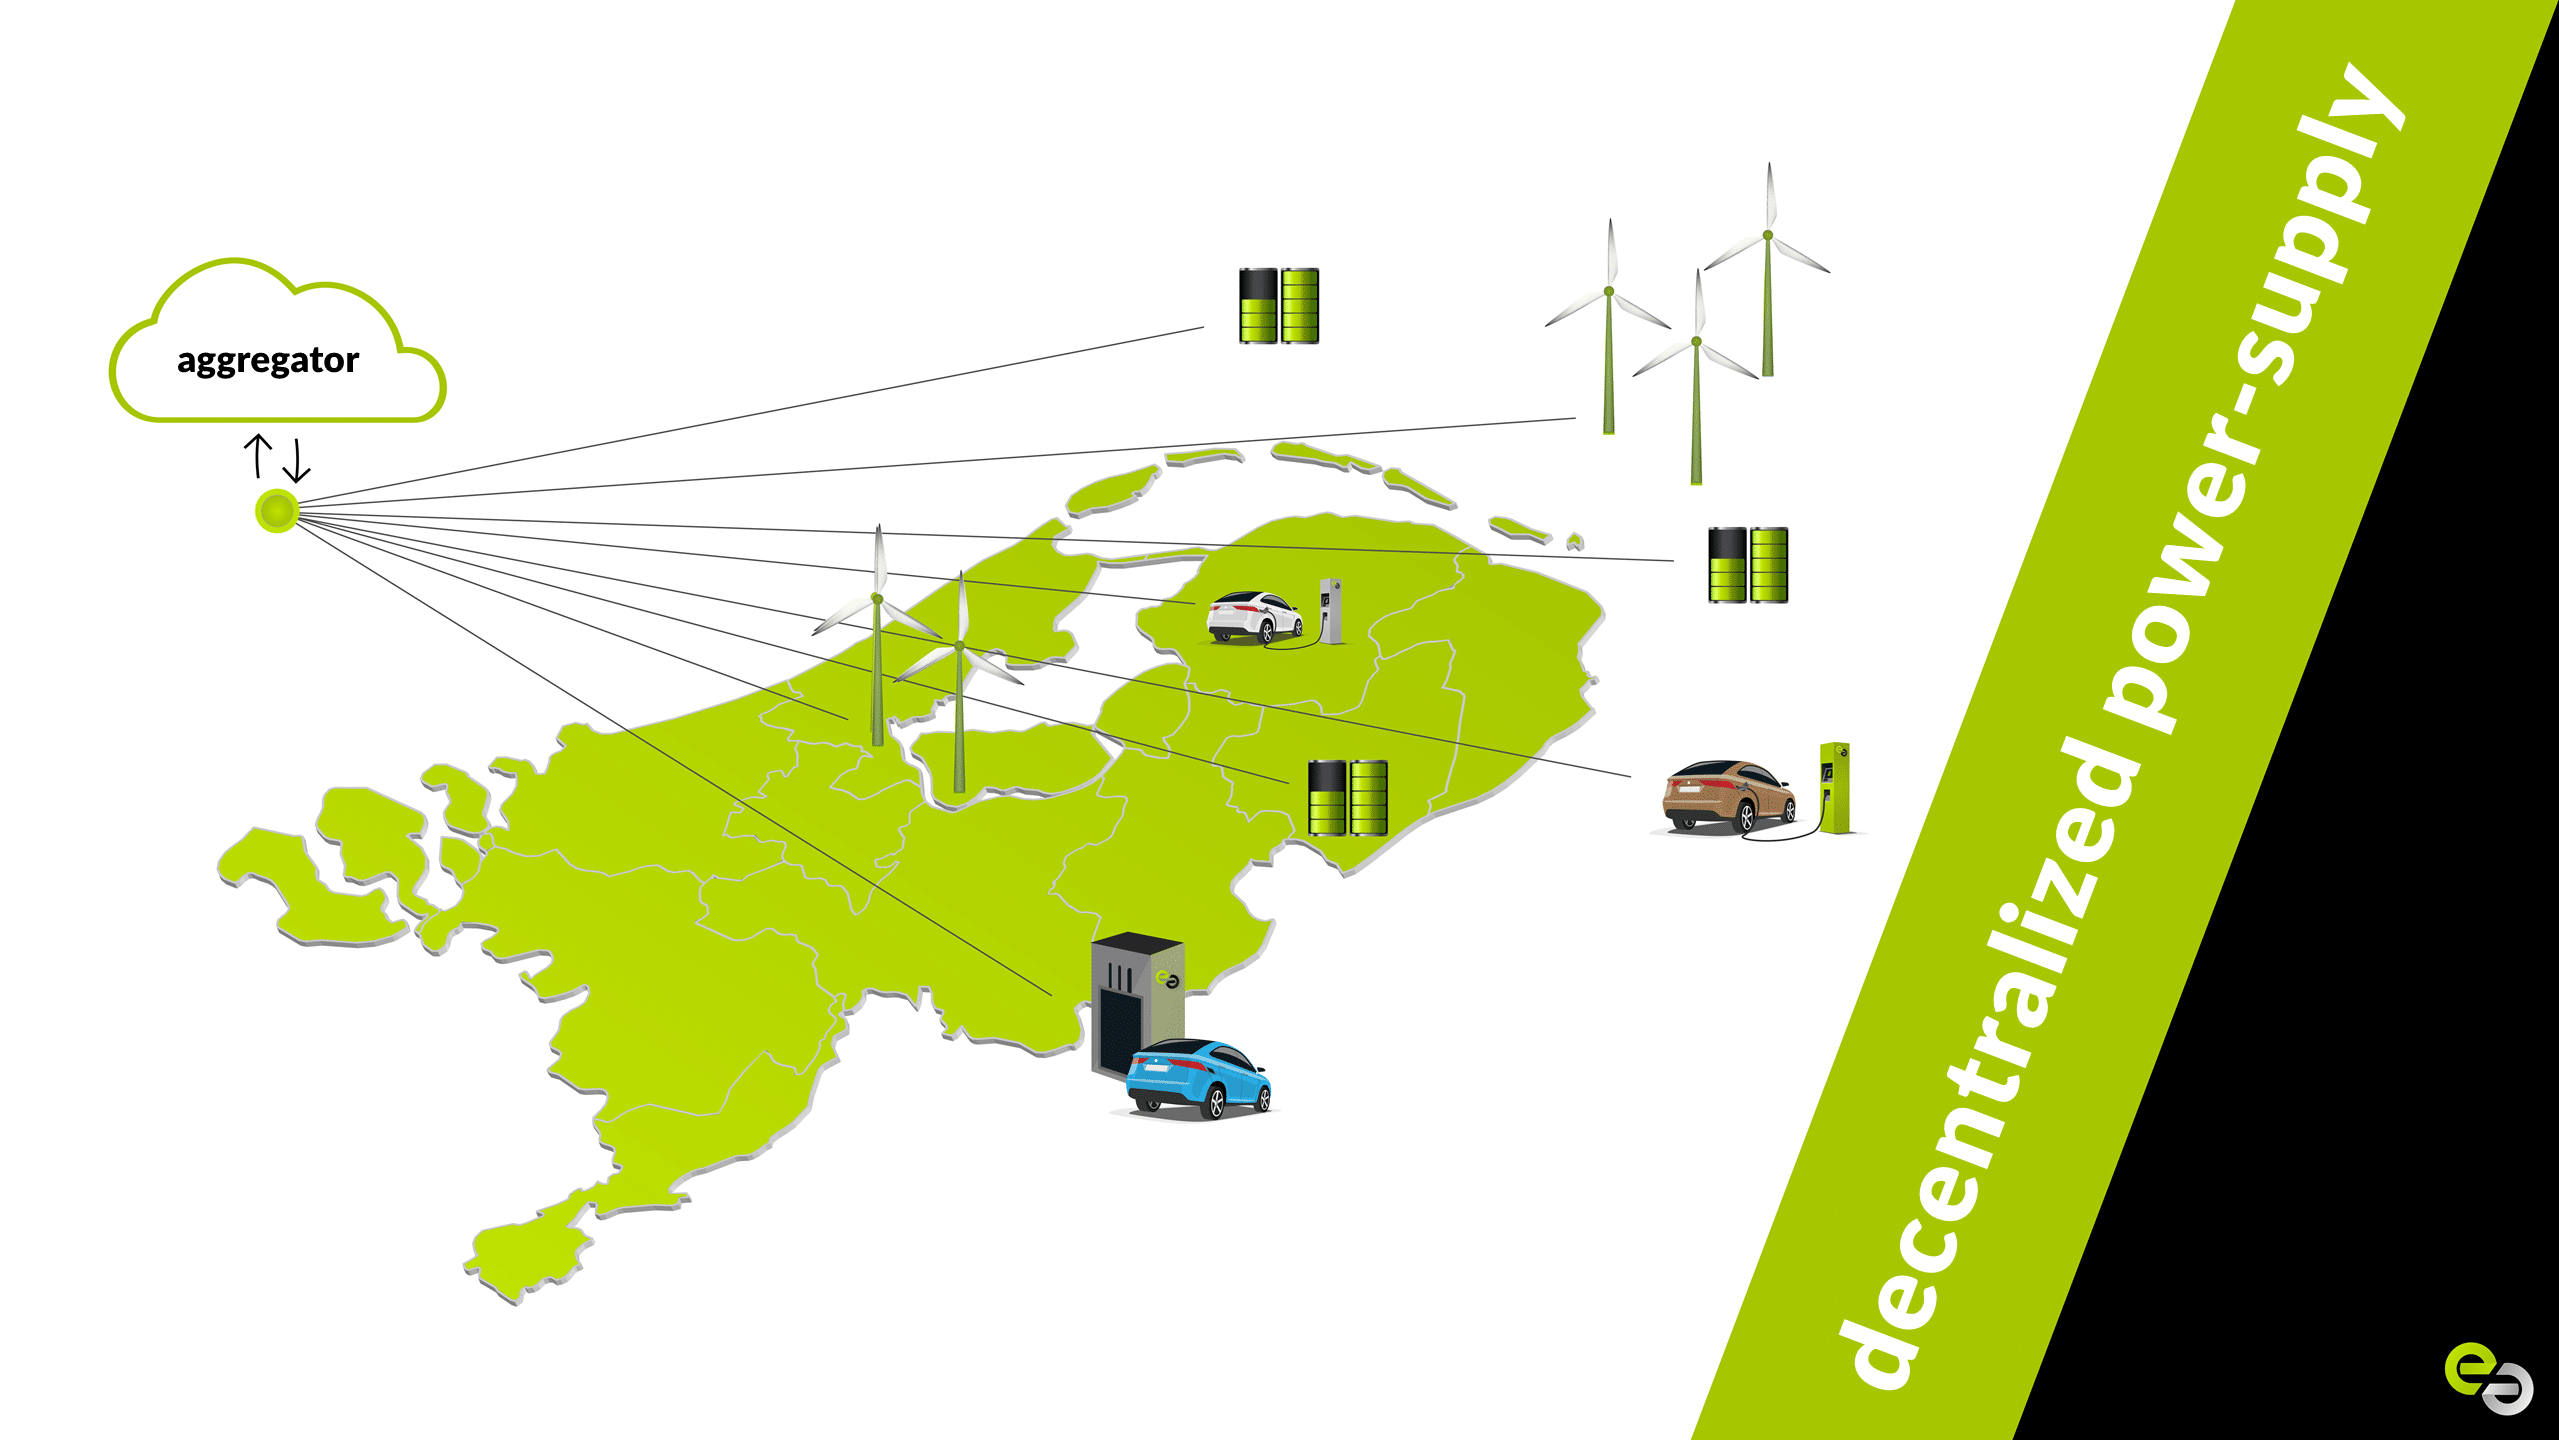 netaansluiting services - grid services